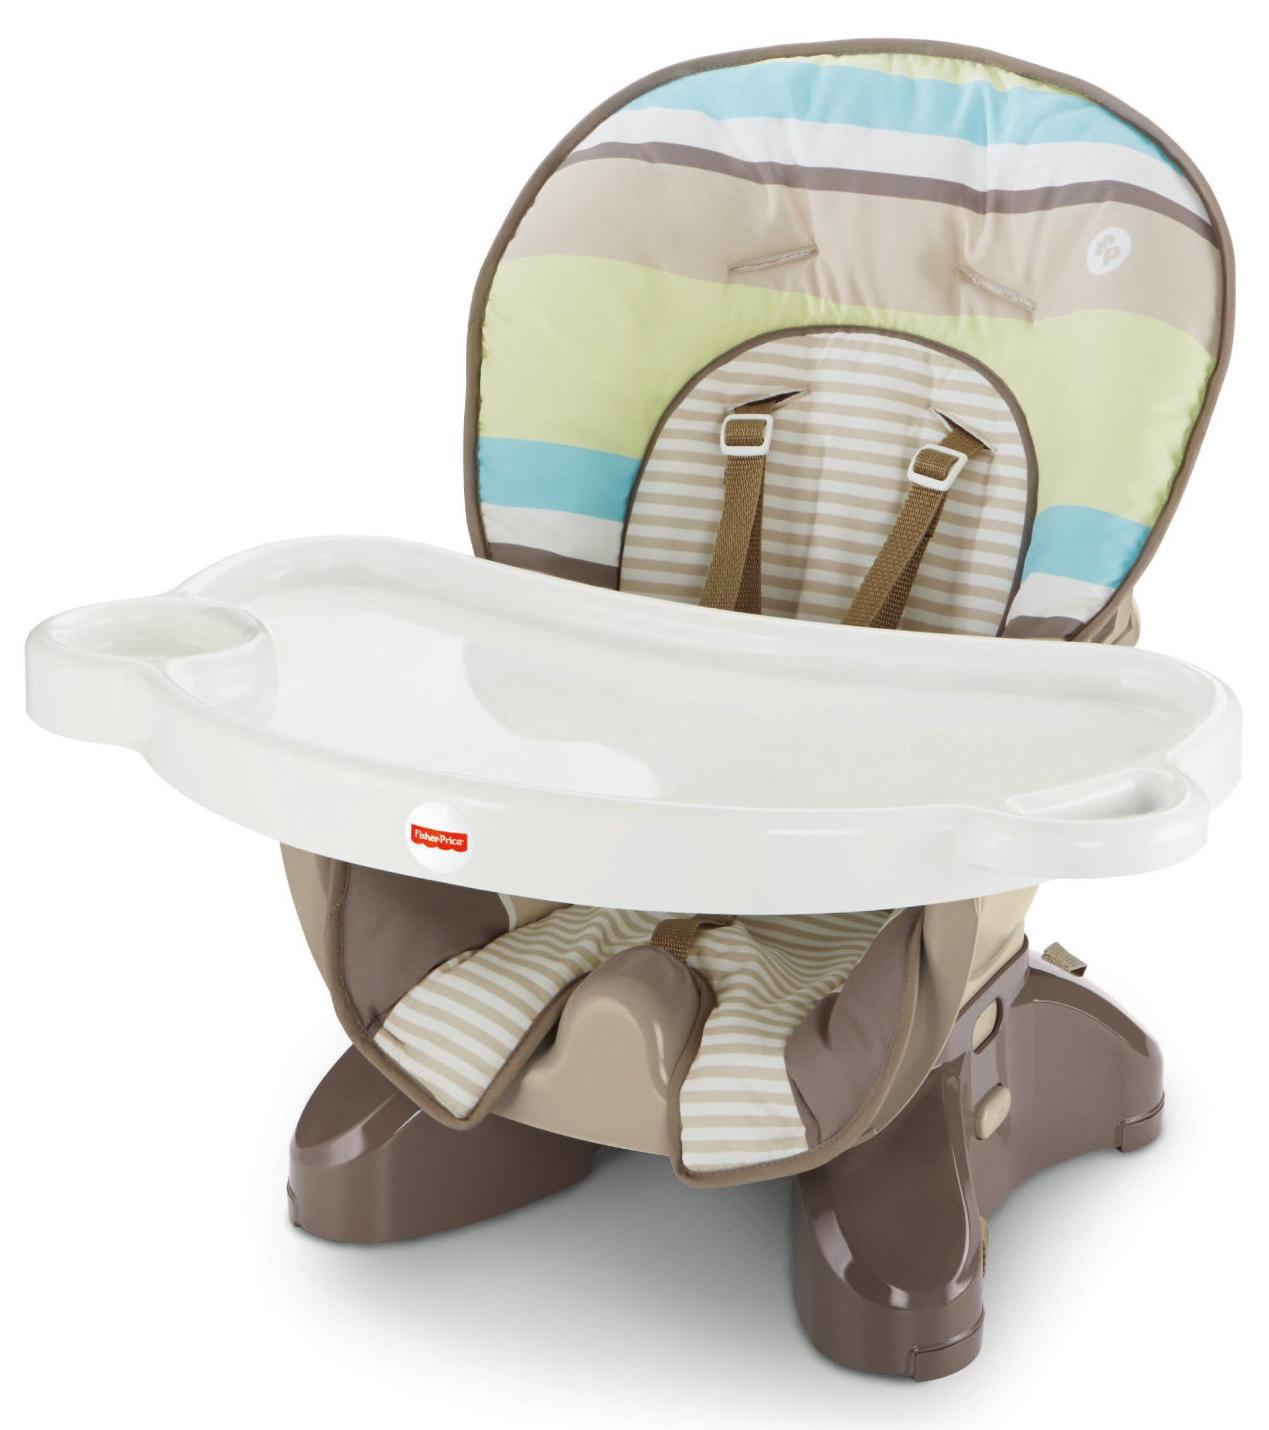 Amazoncom  FisherPrice Spacesaver High Chair Stripes